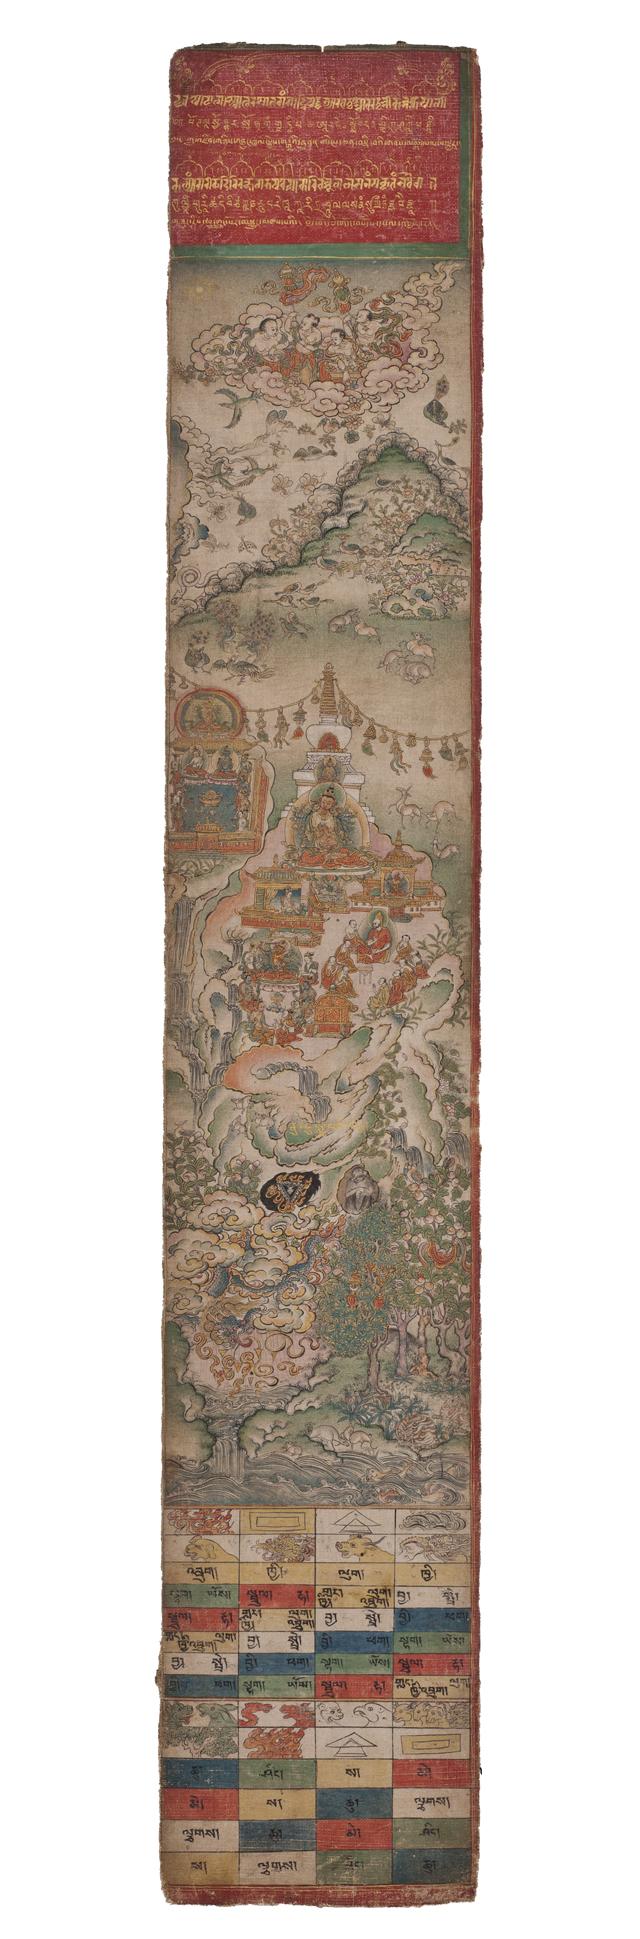 'White Beryl,' Sakya, Tibet (mid-18th century), painted by Sonam Peljor (courtesy Rubin Museum of Art)